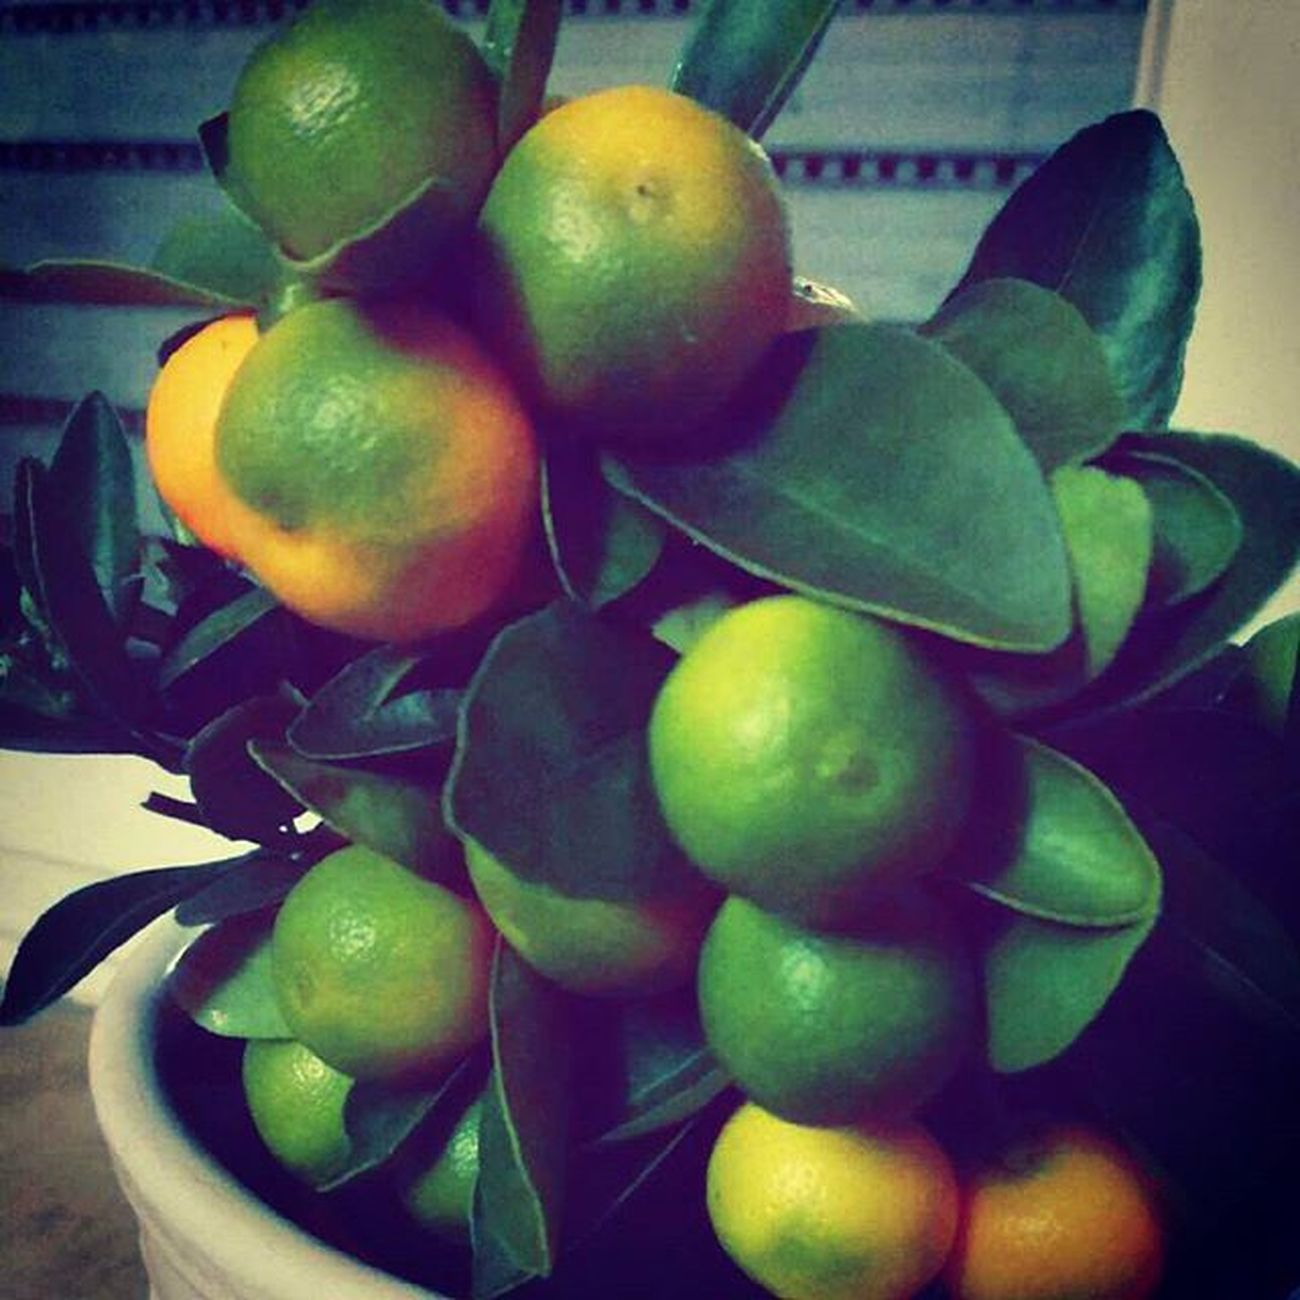 Mandarin Tree Trees Fruit Fruits L4l Instalike Mandarynka Mandarynki Owoc Owoce Drzewo Drzewko